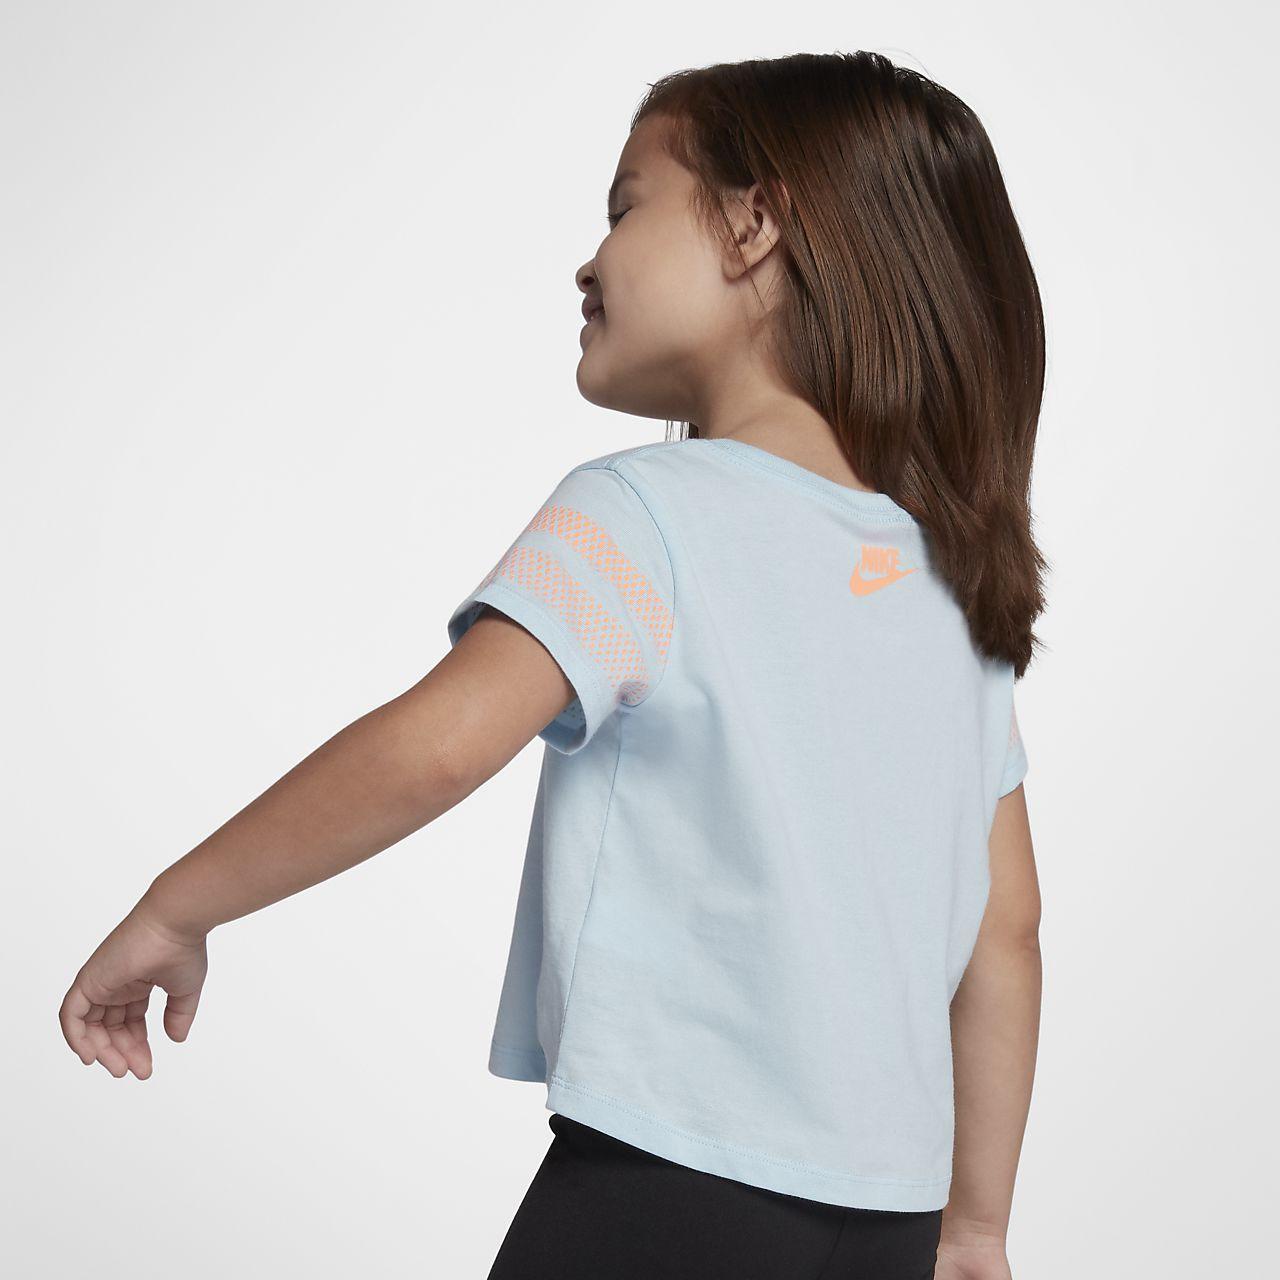 Pequeña Do Niña Nike It Camiseta Sportswear Just QrhxBtdCs